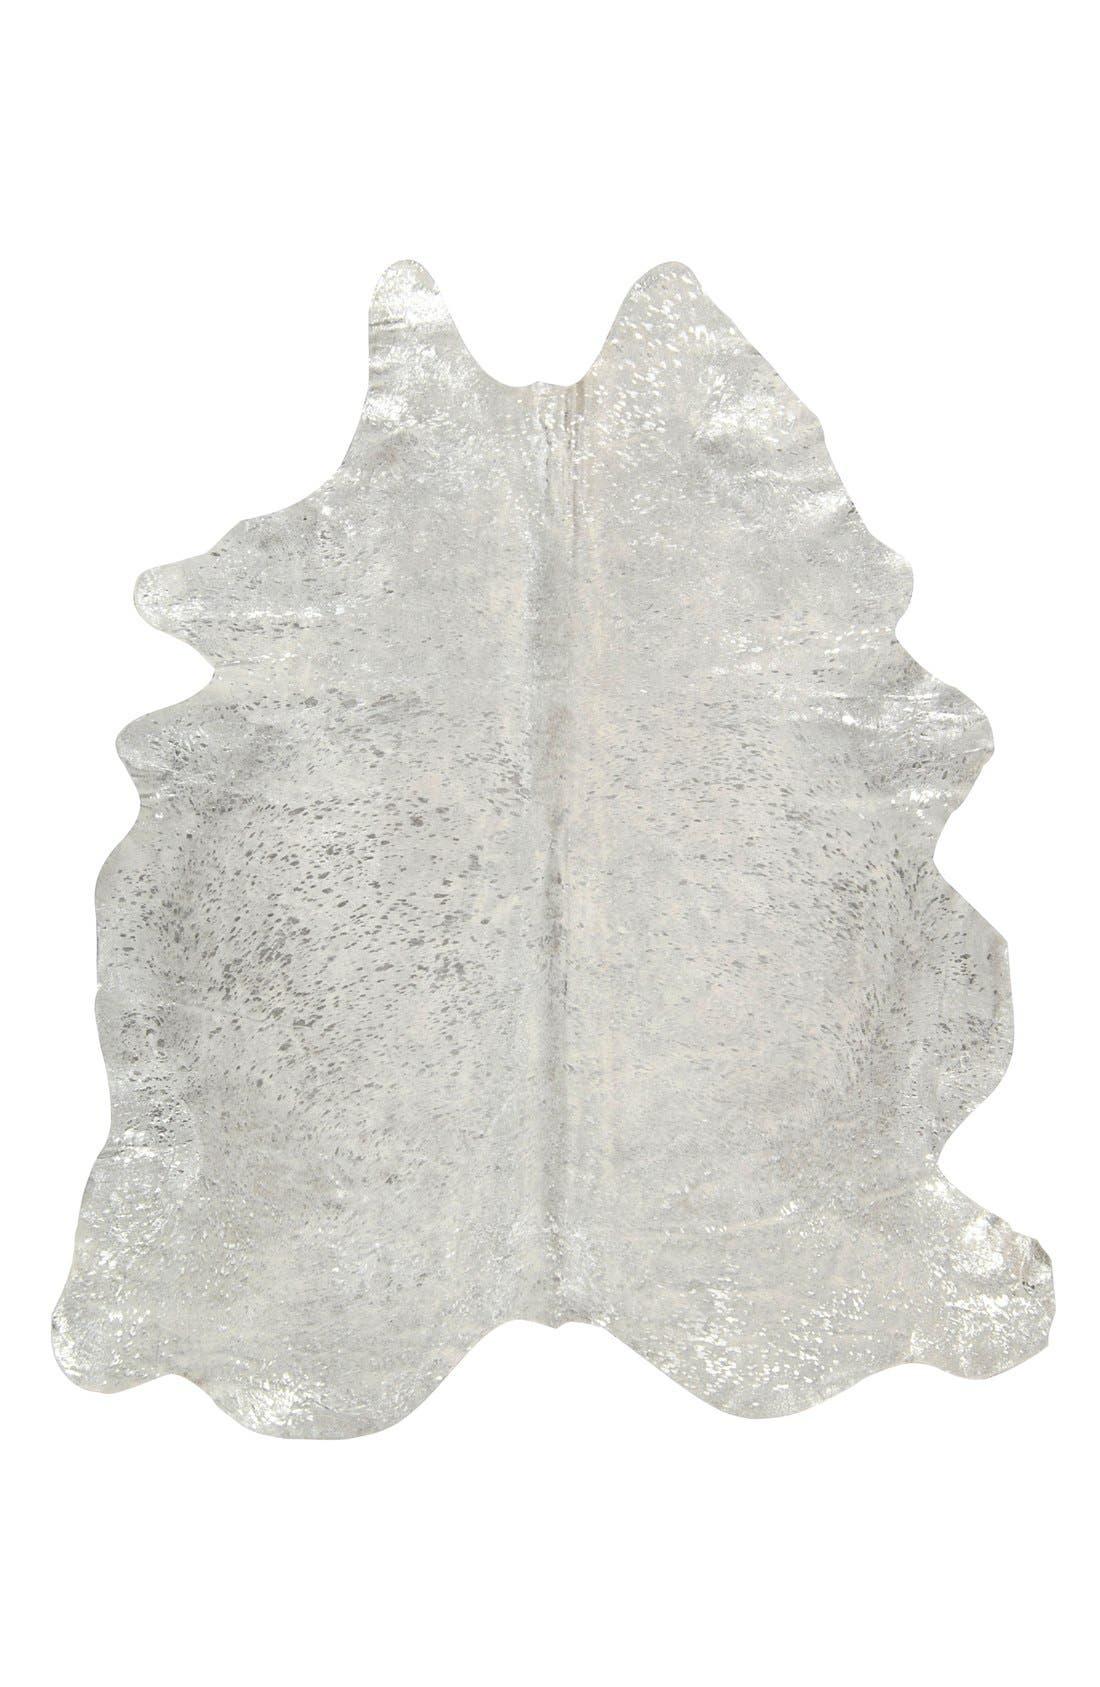 'Metallic Splash' Genuine Cowhide Rug,                         Main,                         color, SILVER